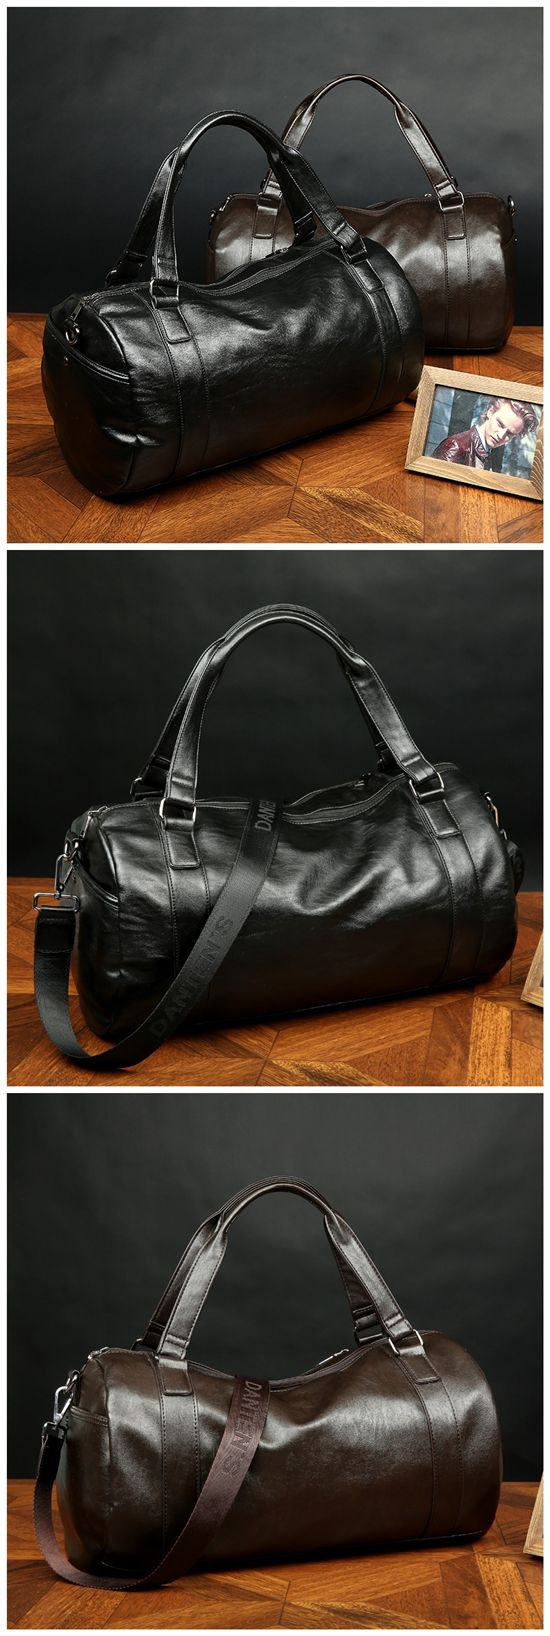 Men's Leather PU Large Vintage Travel Gym Weekend Overnight Bag Duffle Handbags Black Brown Bagail.com